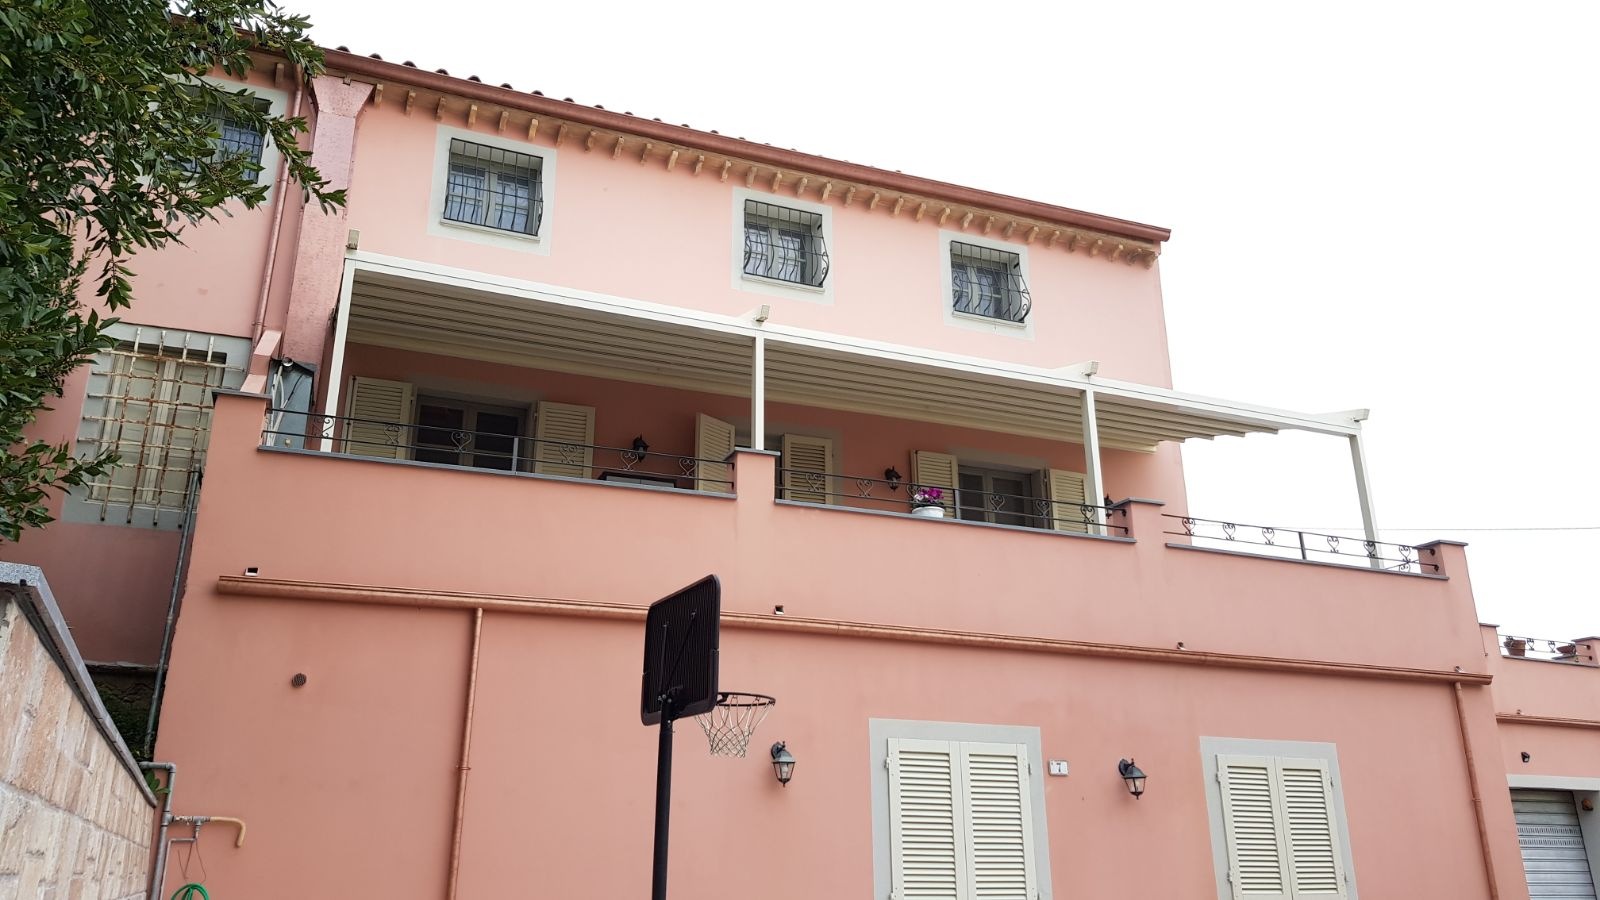 Beautiful Negozi Le Terrazze Images - Idee Arredamento Casa ...